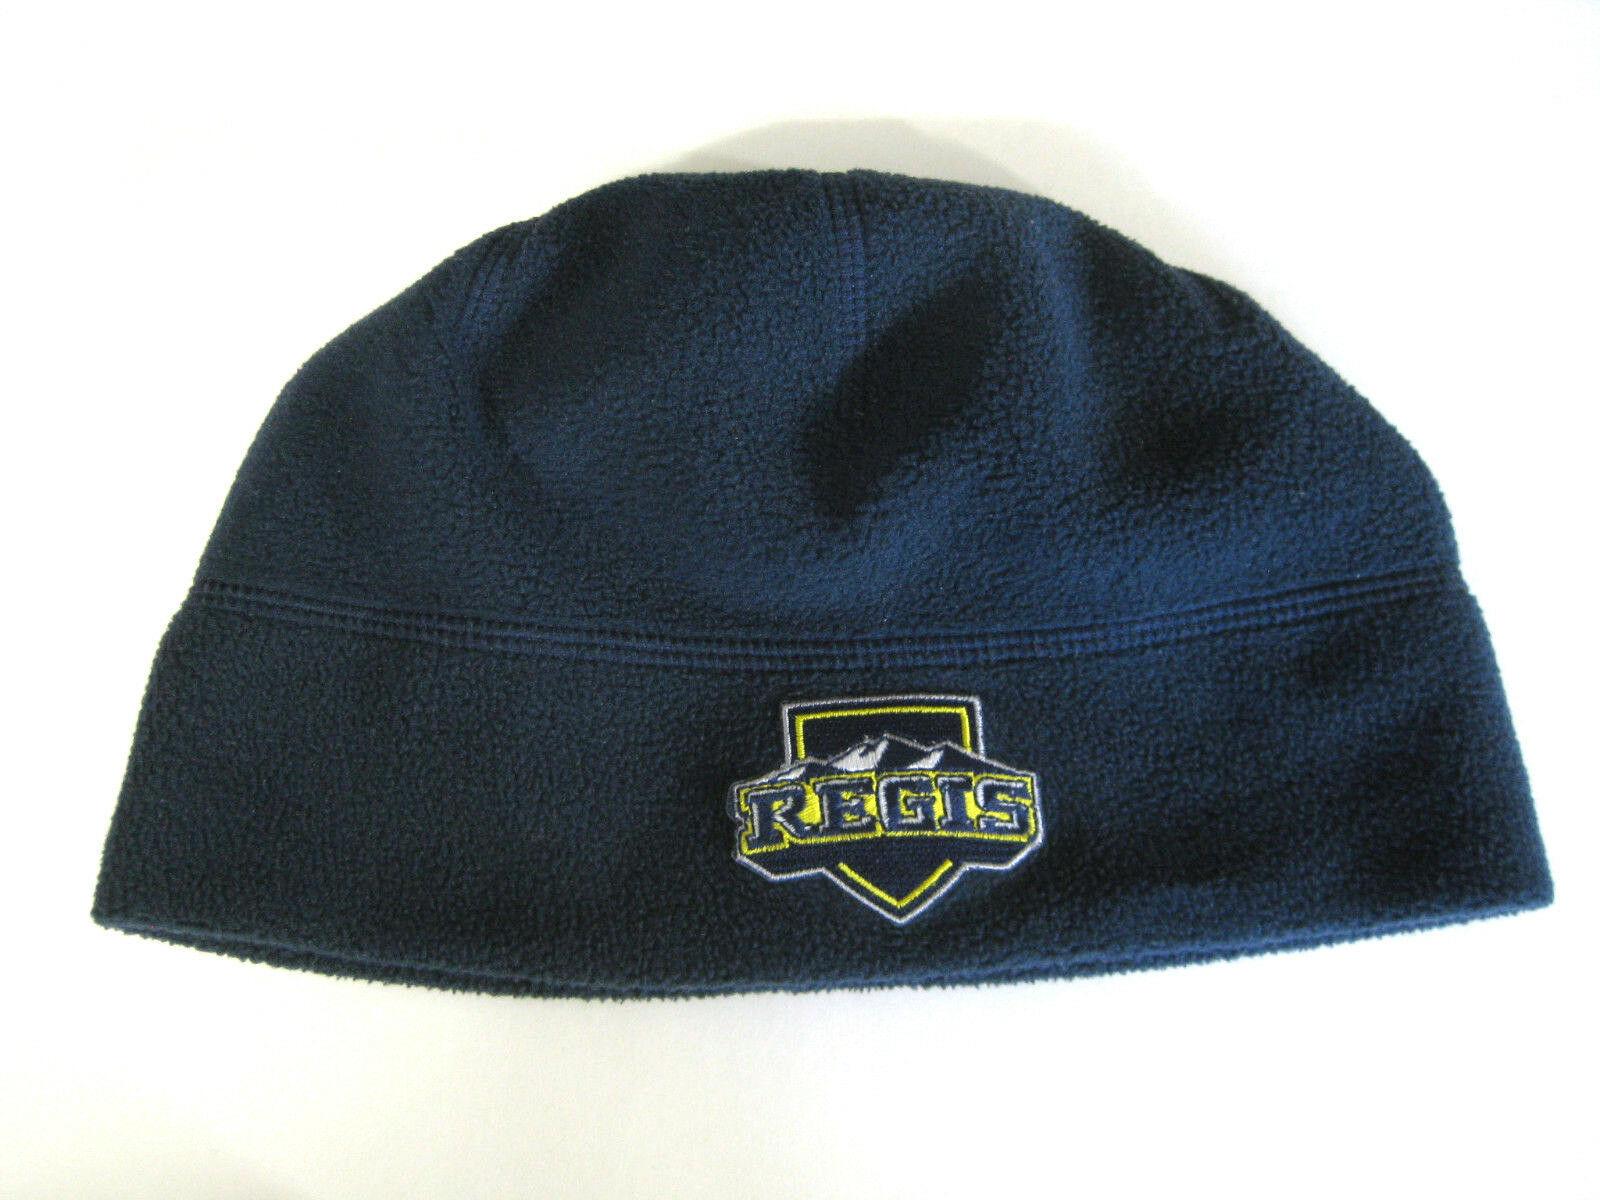 e96d30a20ce4f Regis Columbia Beanie Hat Navy Omni-Heat and 50 similar items. S l1600